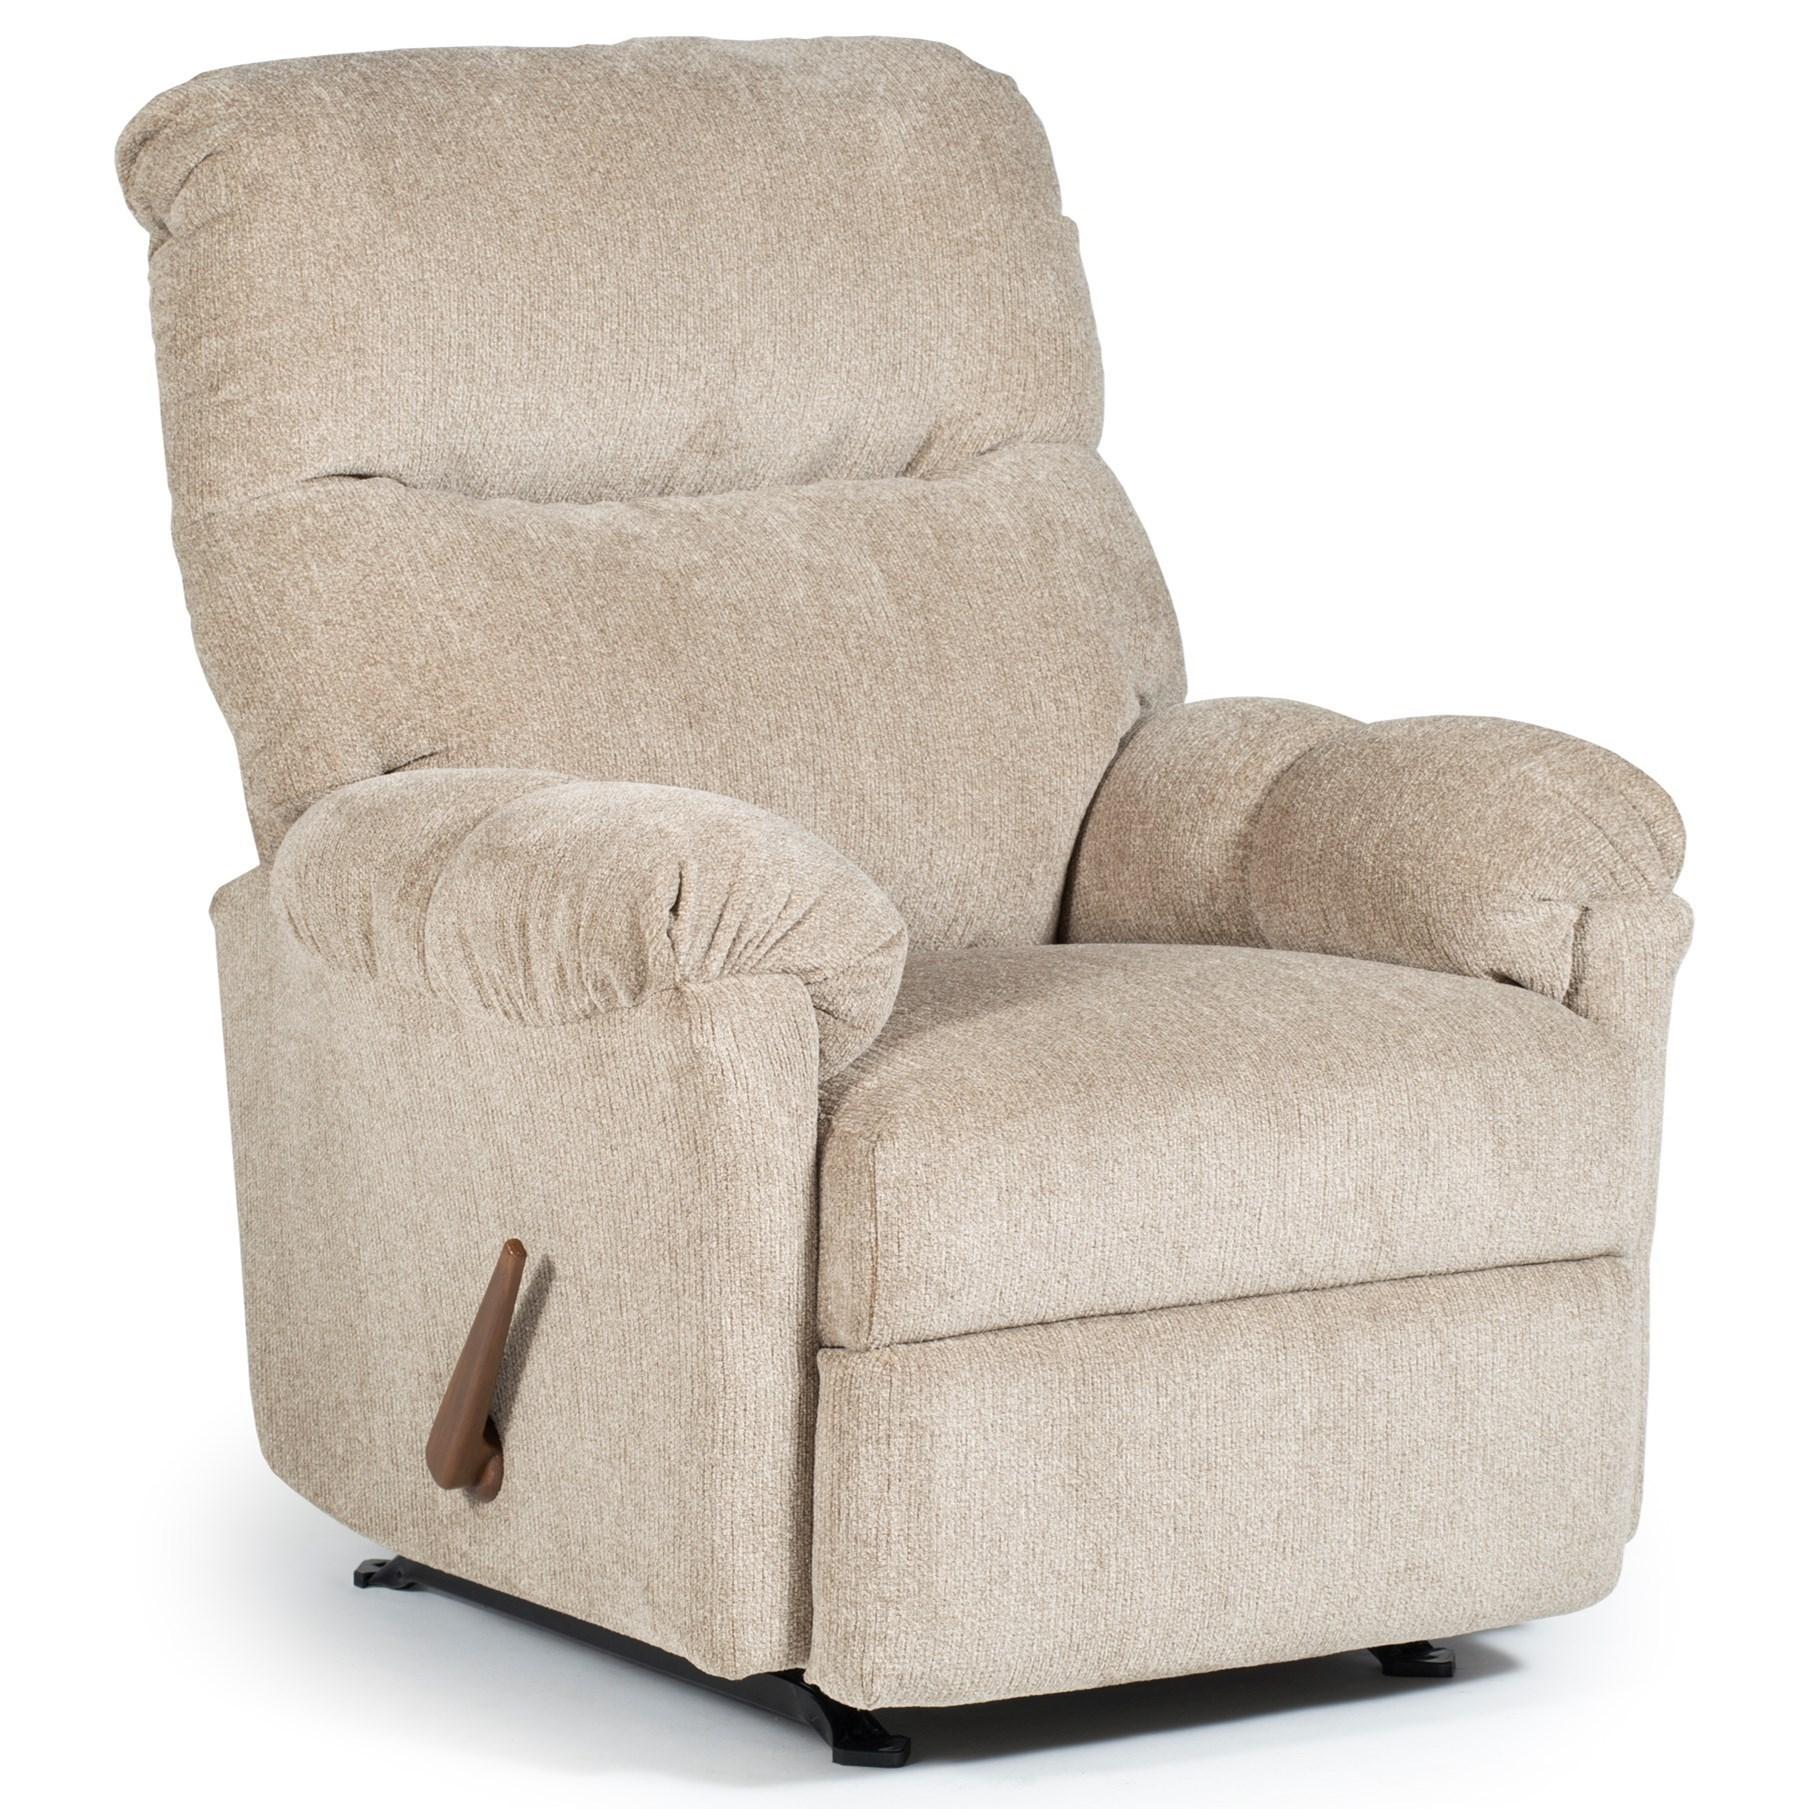 Best Home Furnishings Recliners   Medium Balmore Swivel Rocking Reclining  Chair